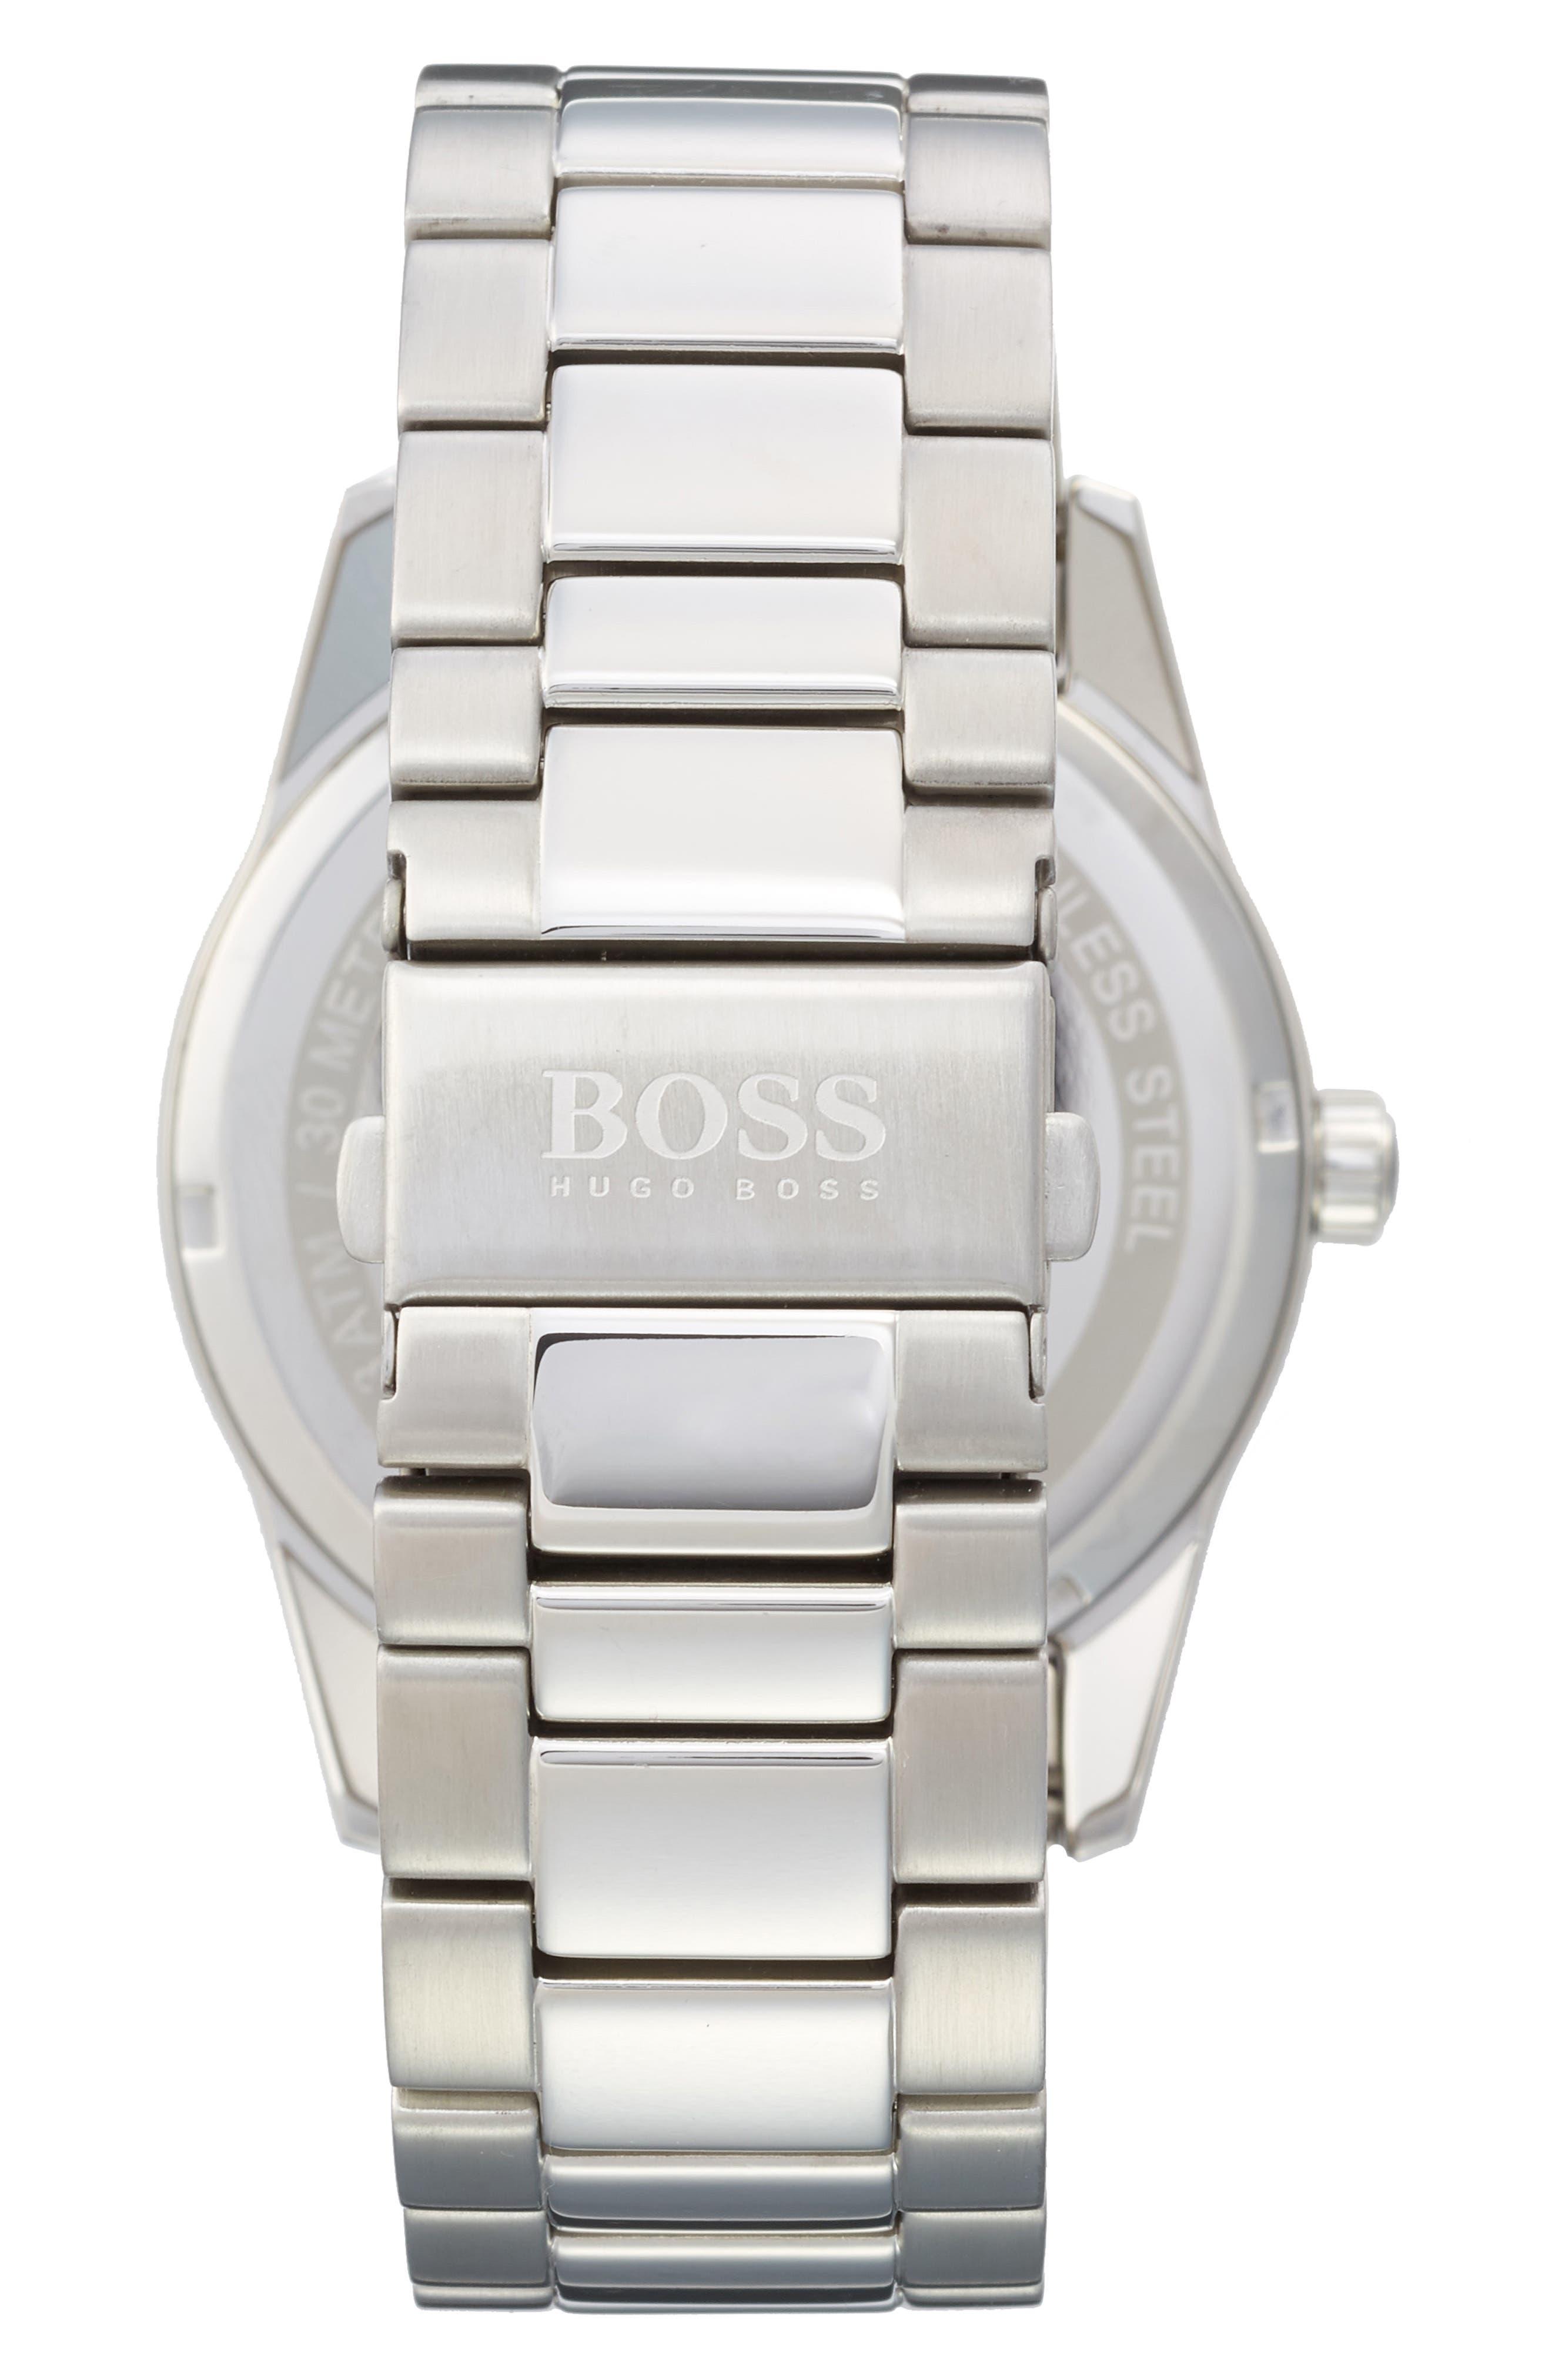 BOSS,                             The Heritage Bracelet Watch, 43mm,                             Alternate thumbnail 2, color,                             040